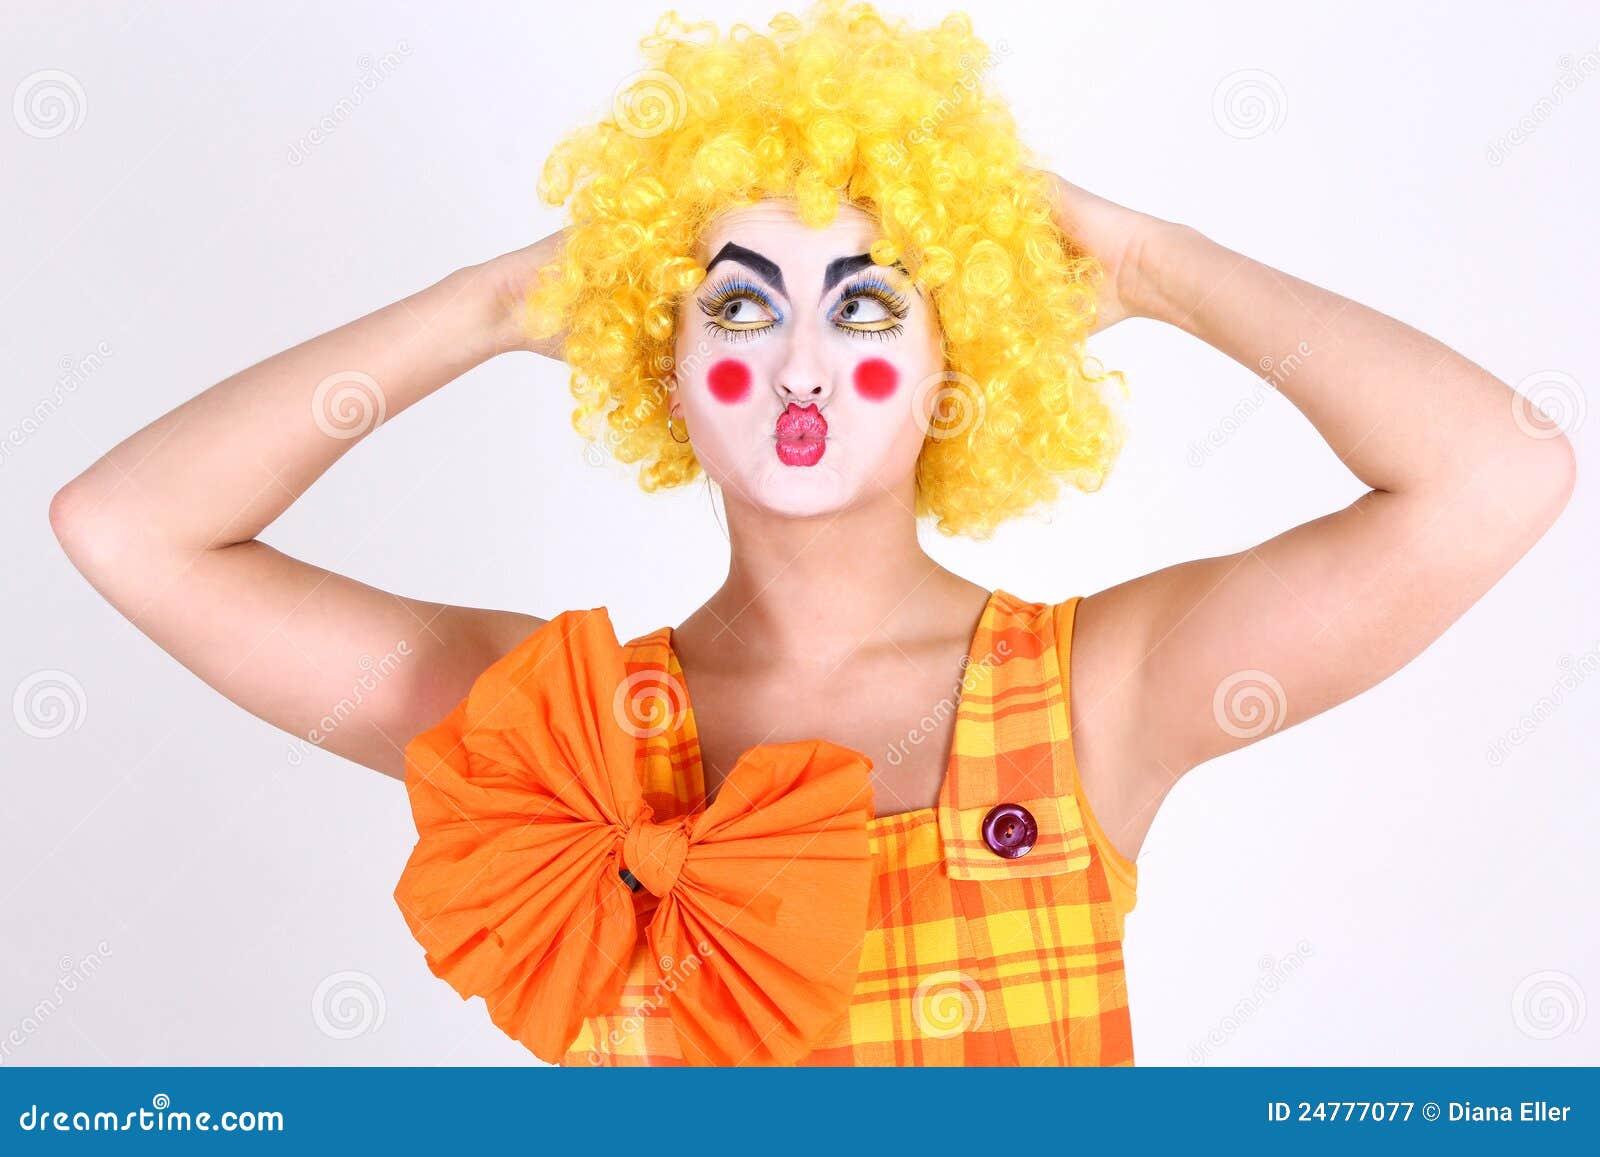 maquillaje payaso divertido